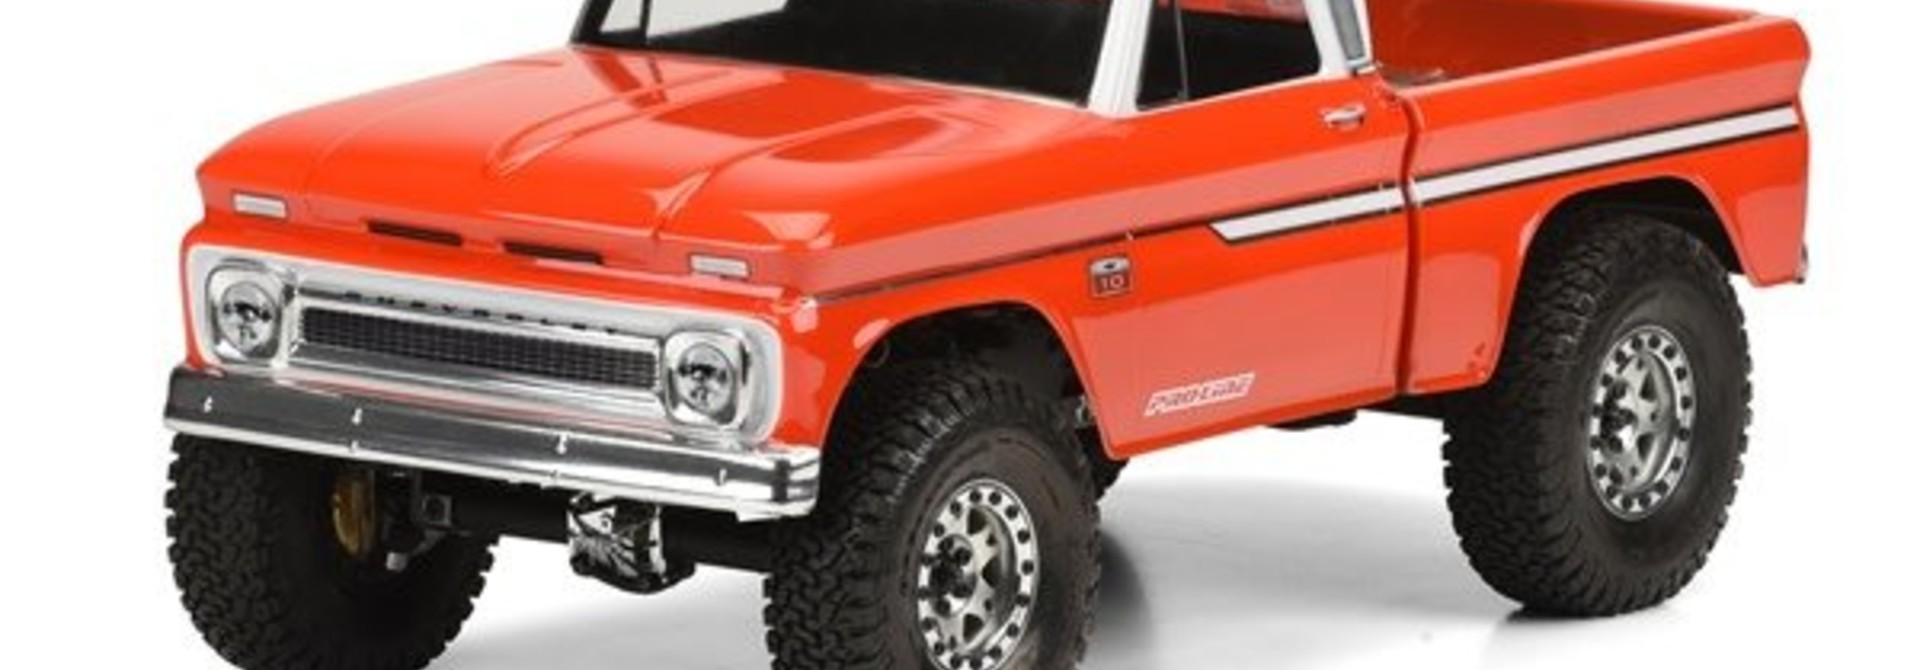 1966 Chevrolet C-10 (Cab/Bed) SCX10 Trail Honcho